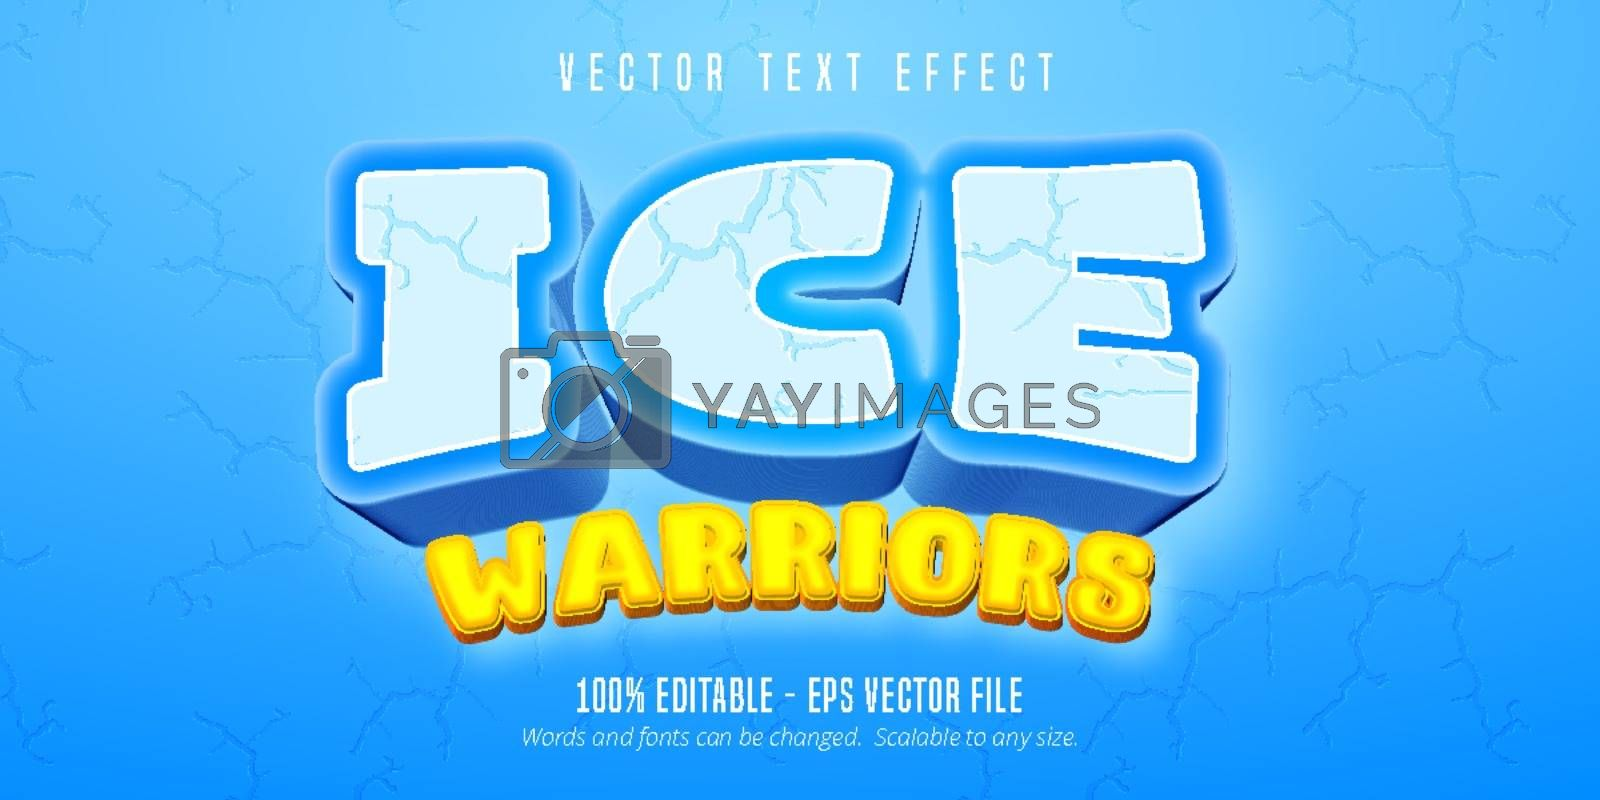 Ice warriors text, cartoon game style editable text effect